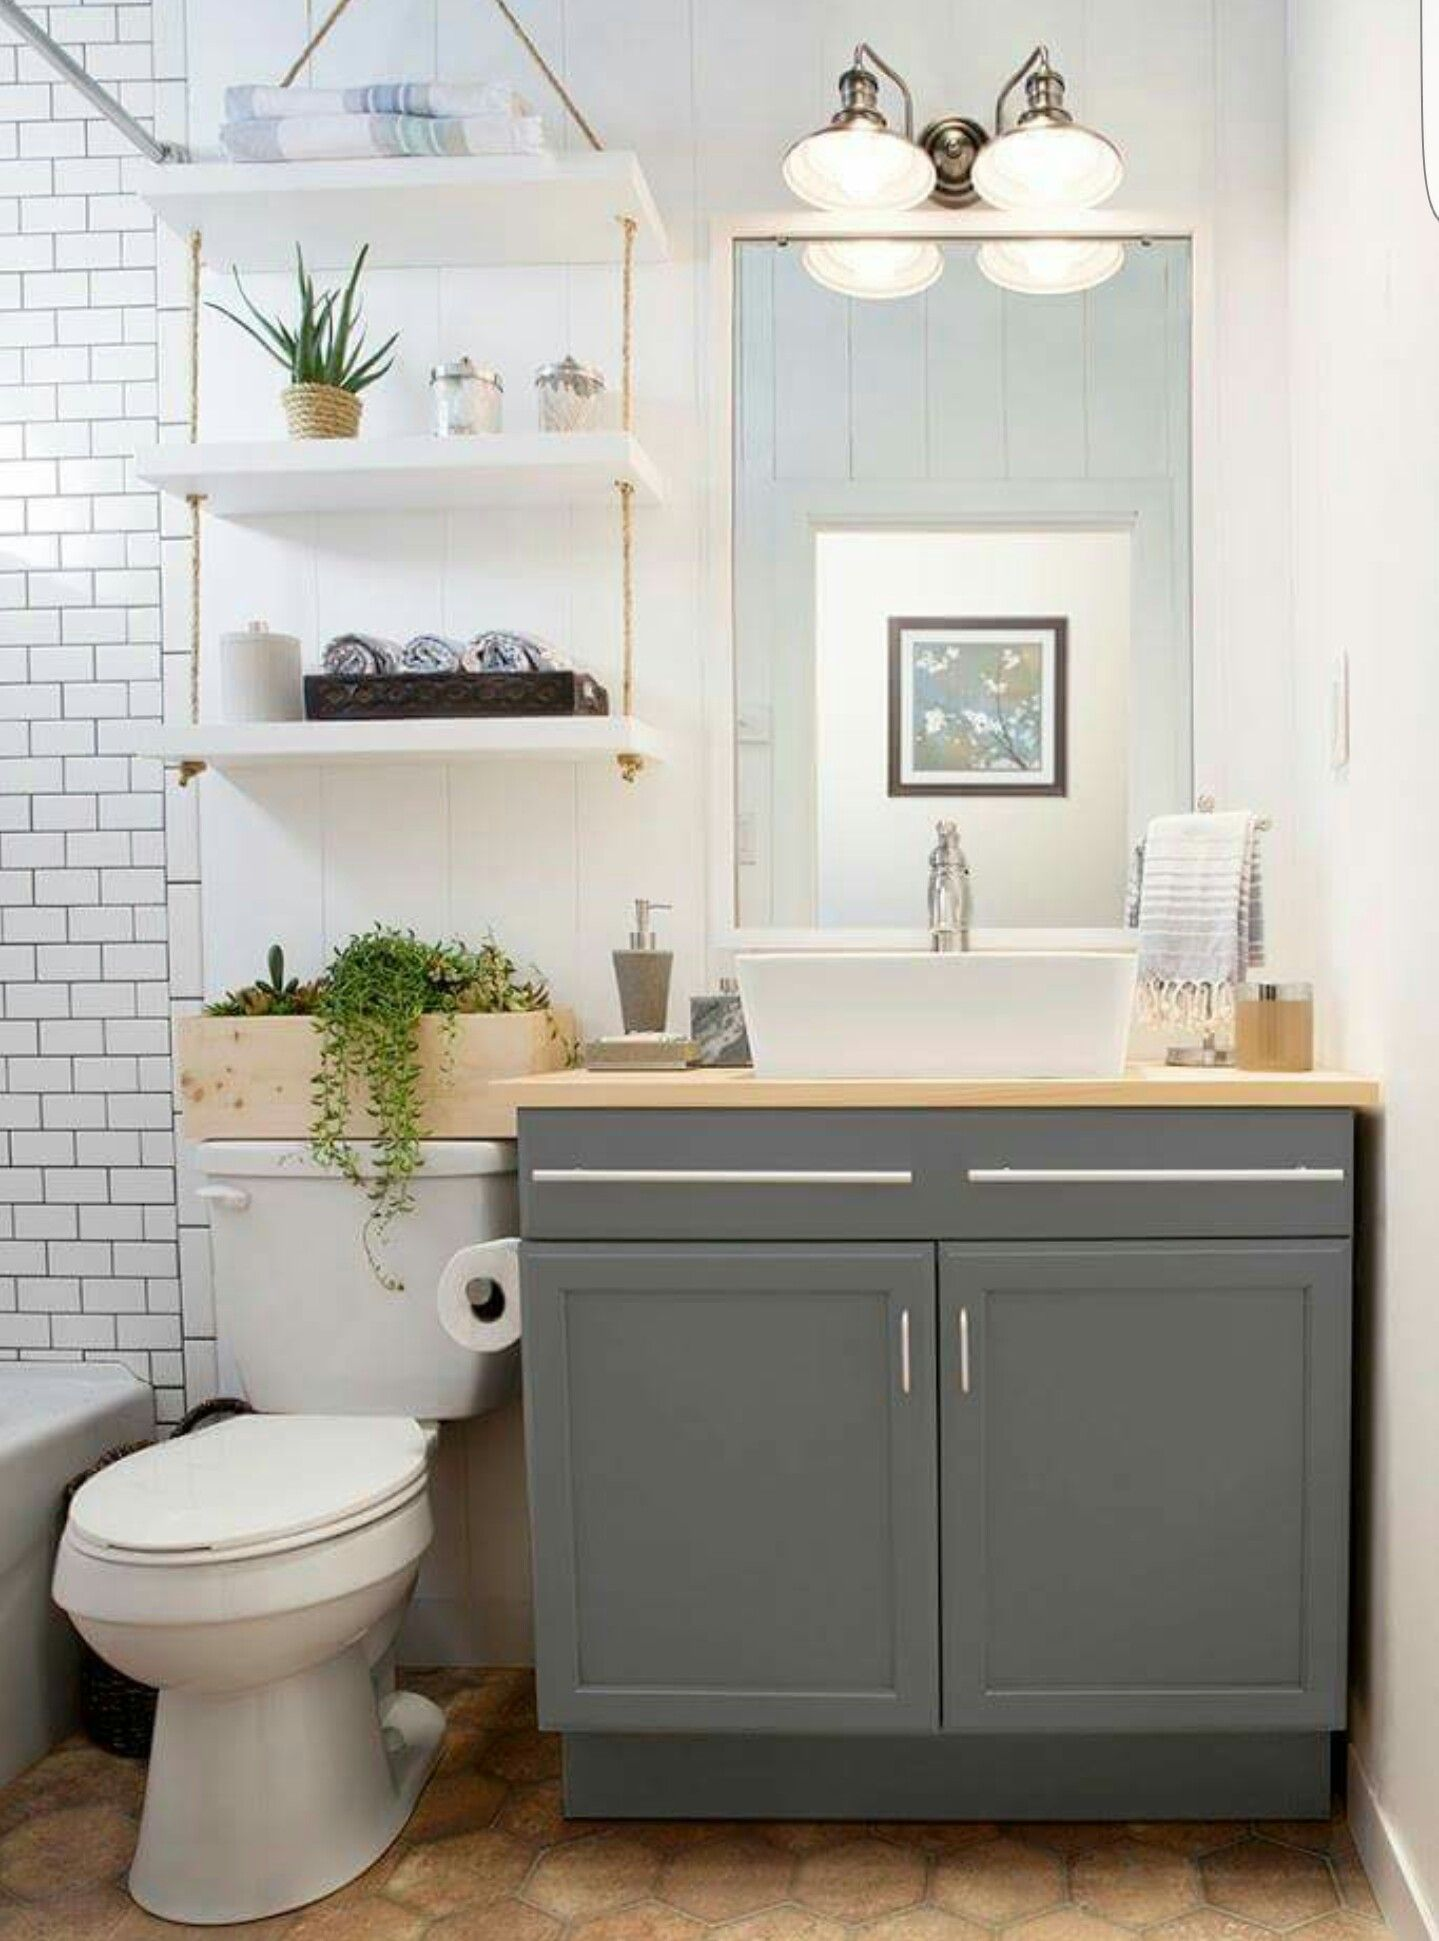 Love The Shelf Over The Toilet Bathroom Design Small Bathroom Storage Over Toilet Small Bathroom Remodel